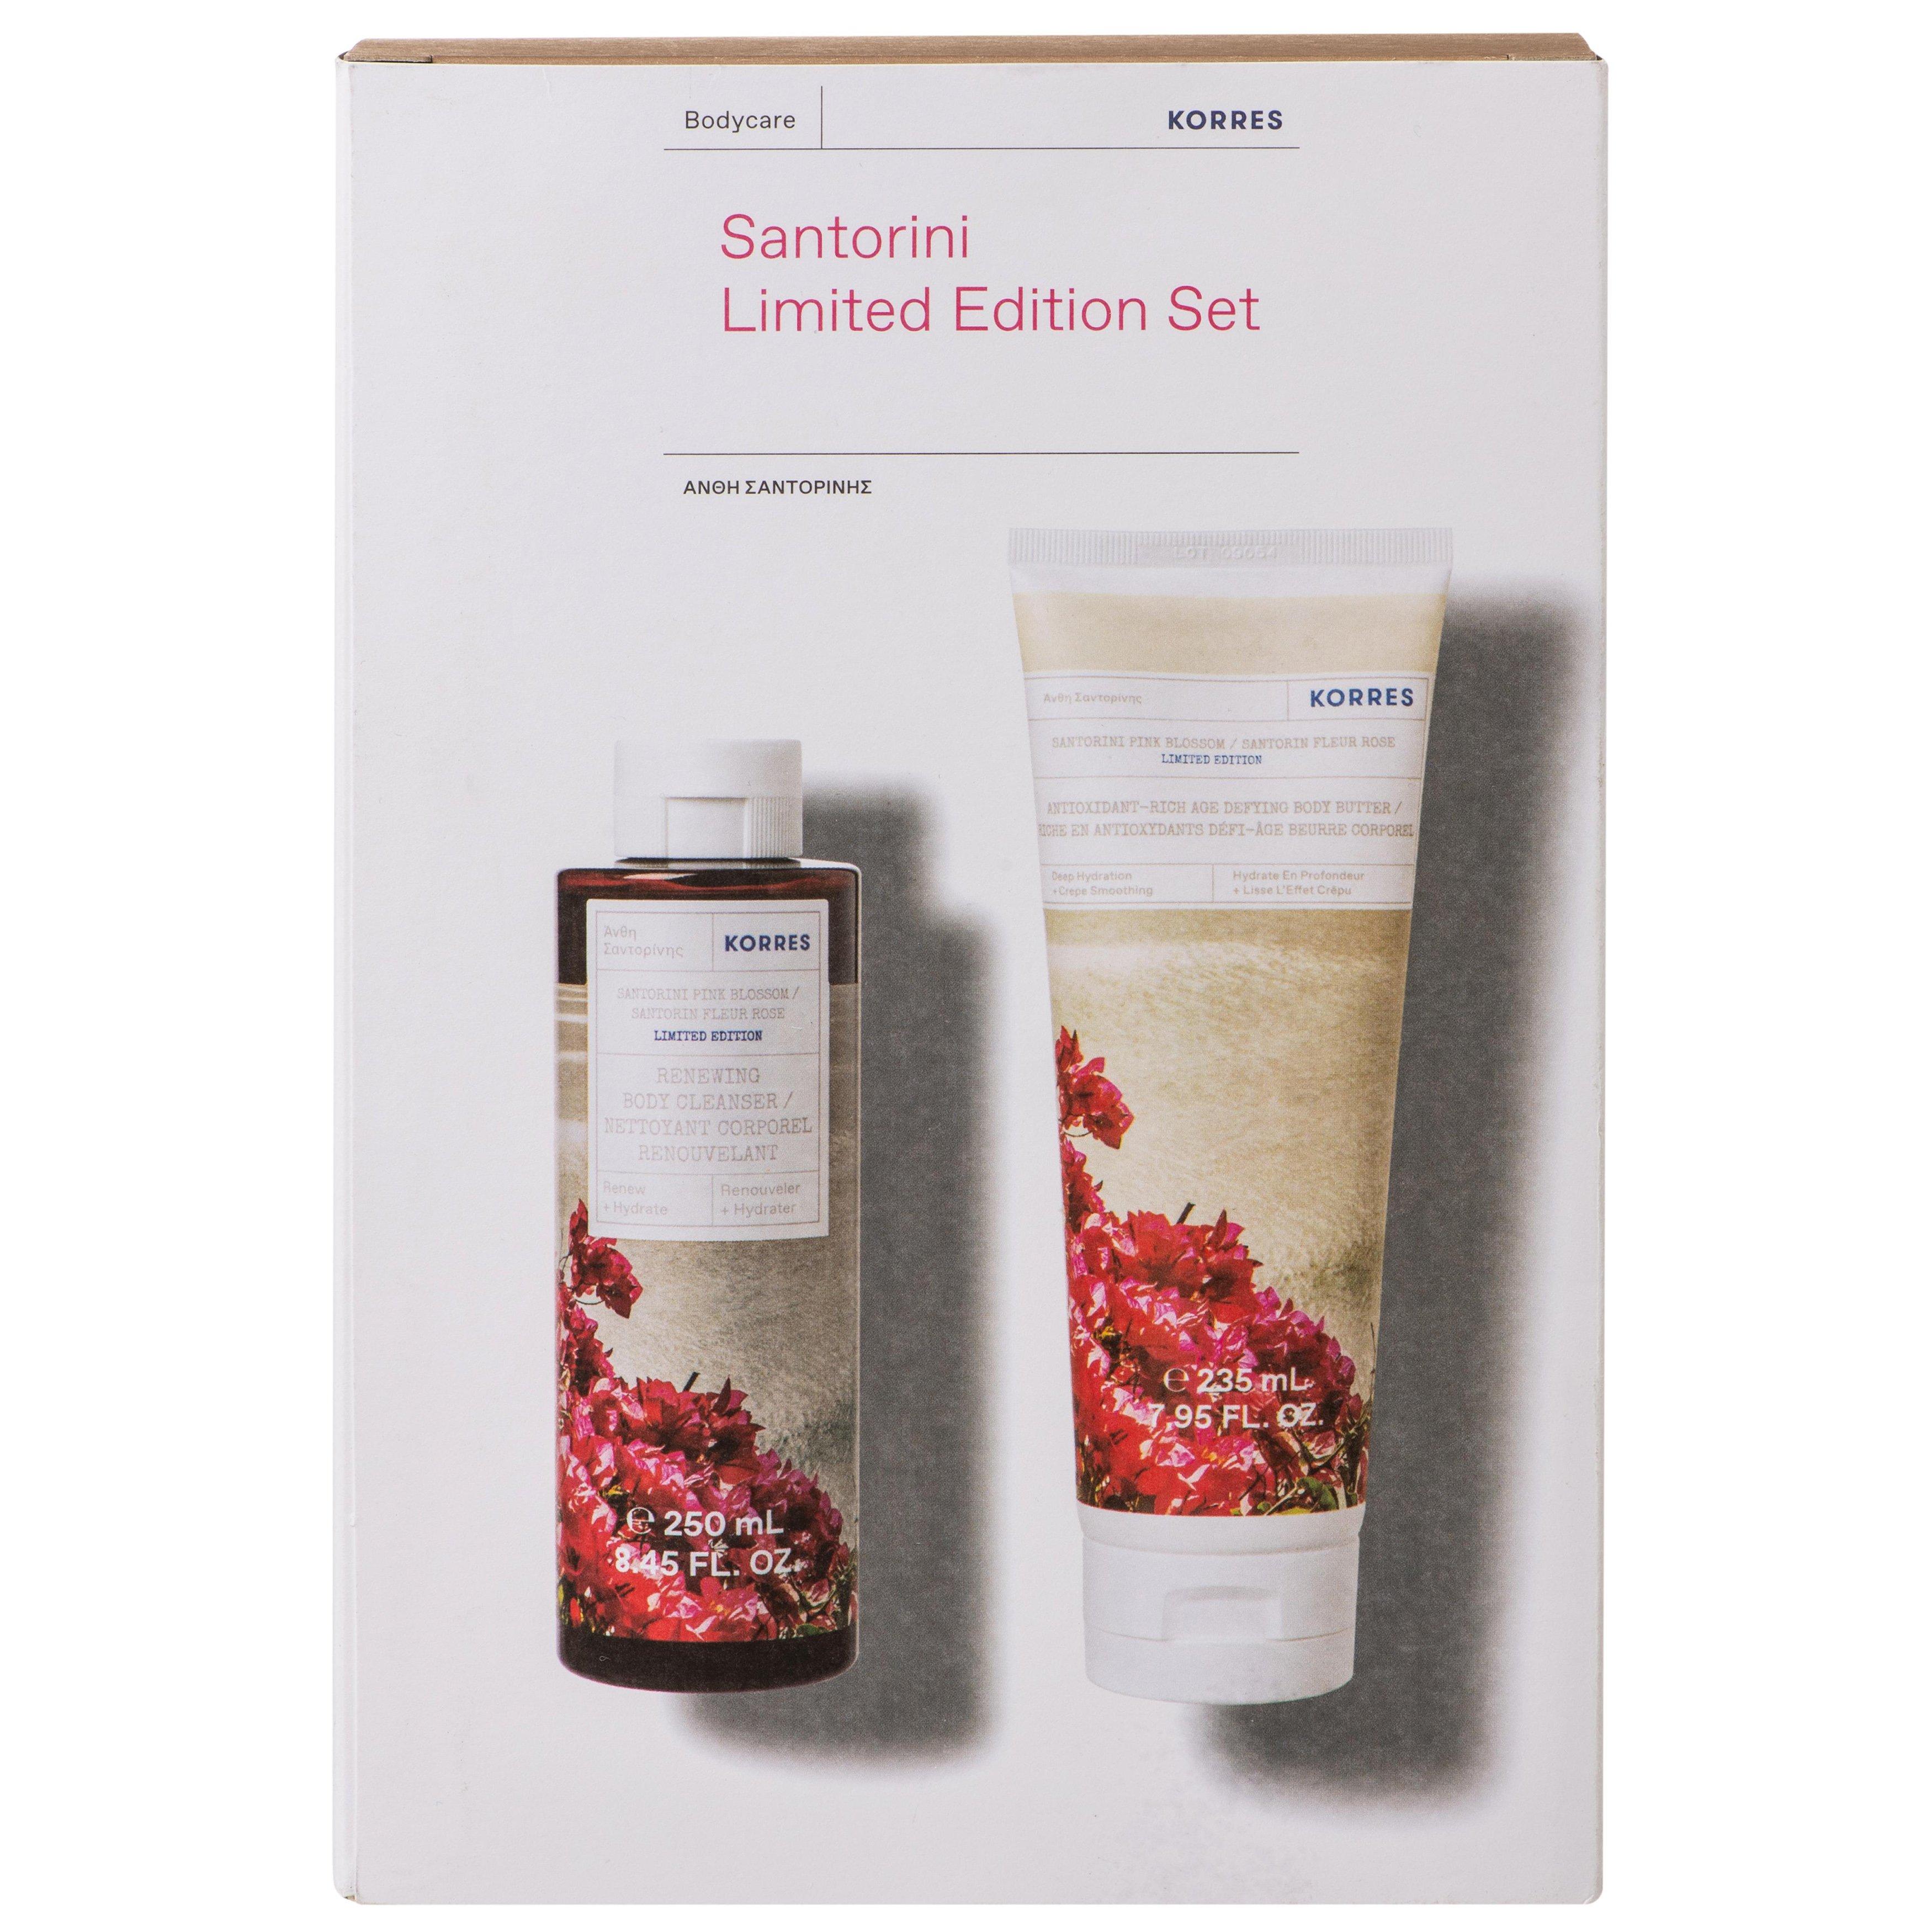 Korres Πακέτο Προσφοράς Santorini Limited Edition Set Άνθη Σαντορίνης Αφρόλουτρο 250ml & Γαλάκτωμα Σώματος 235ml